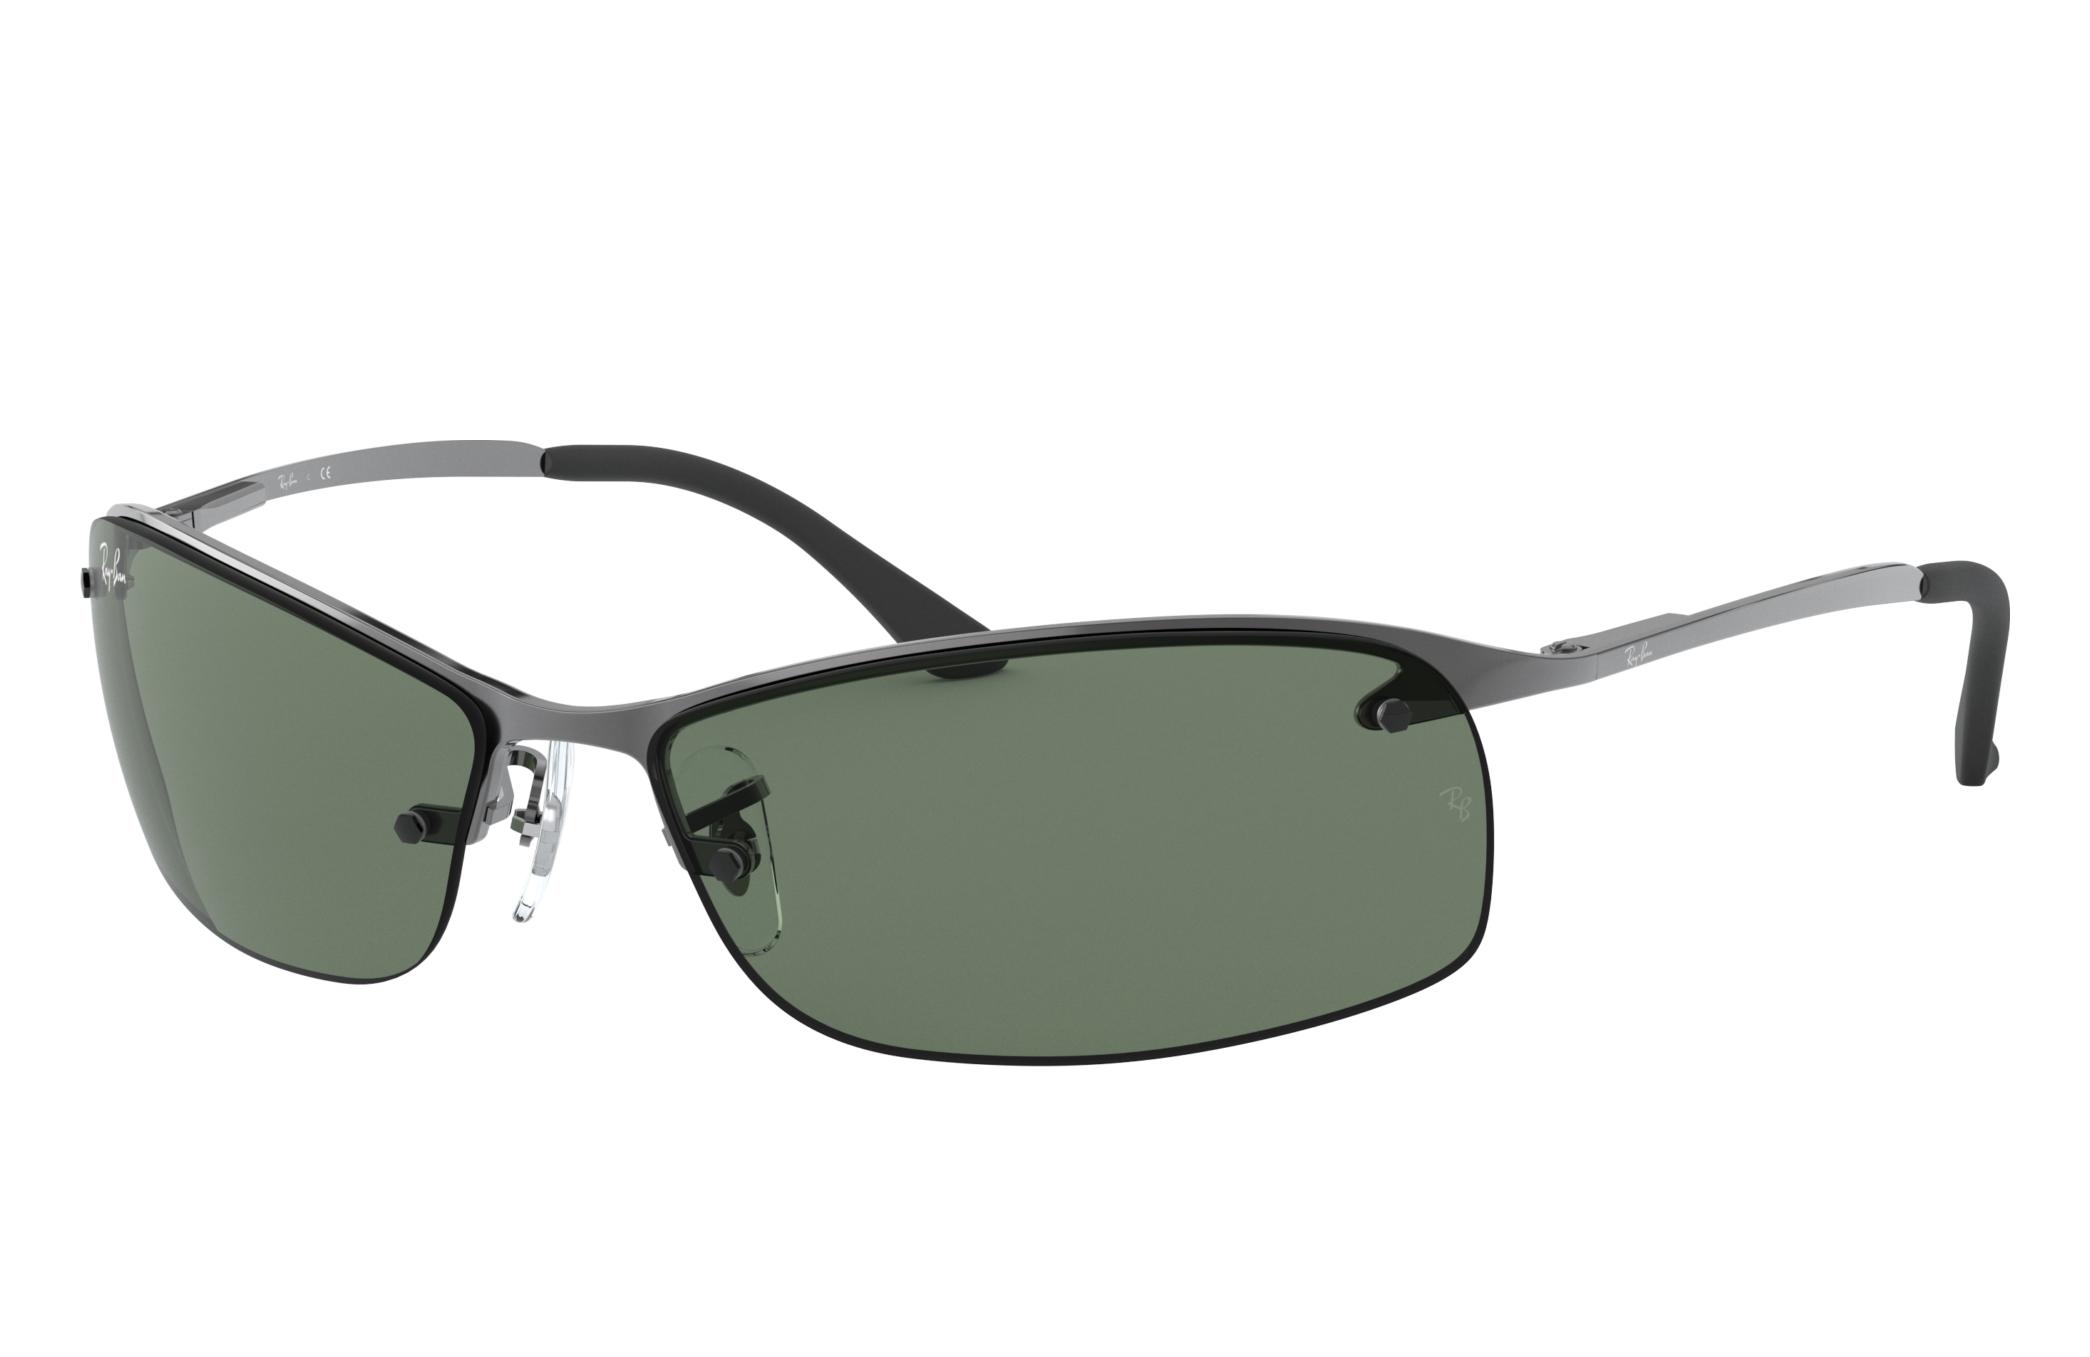 Ray-Ban Rb3183 Gunmetal, Green Lenses - RB3183